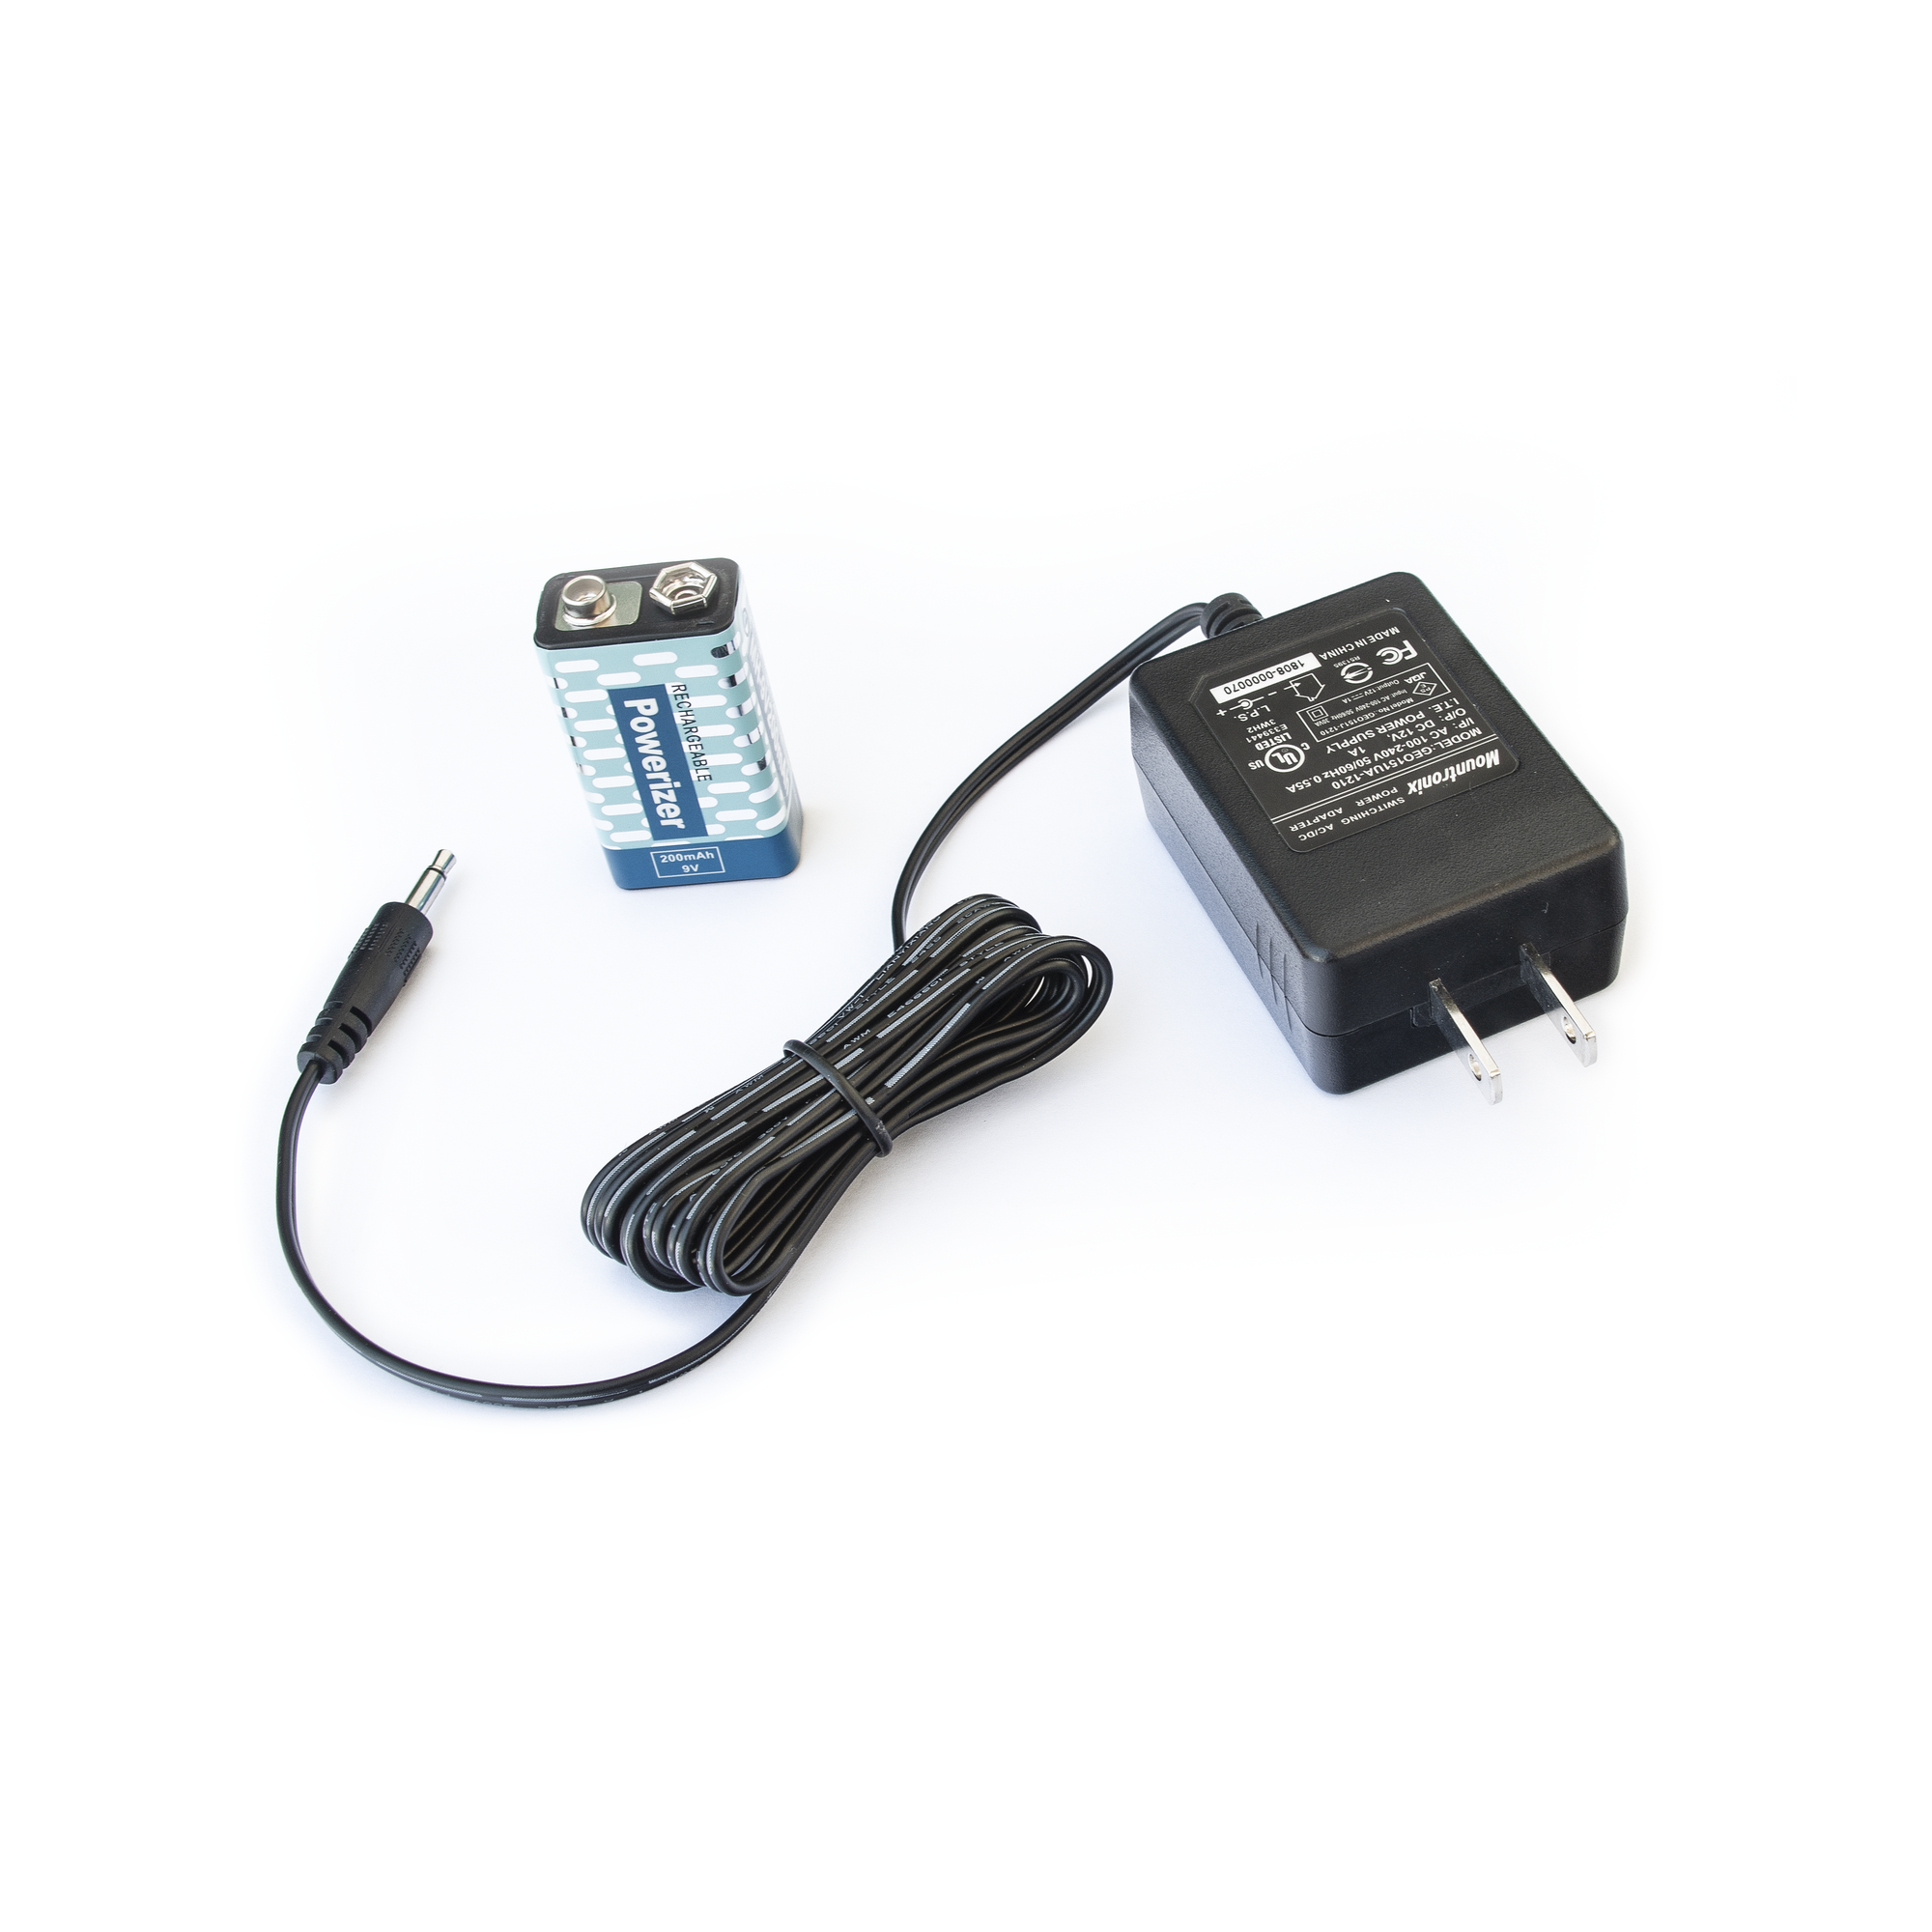 Cargador y bateria recargable de 9 VCD para detector portatil RANGER1000 / RANGER15000